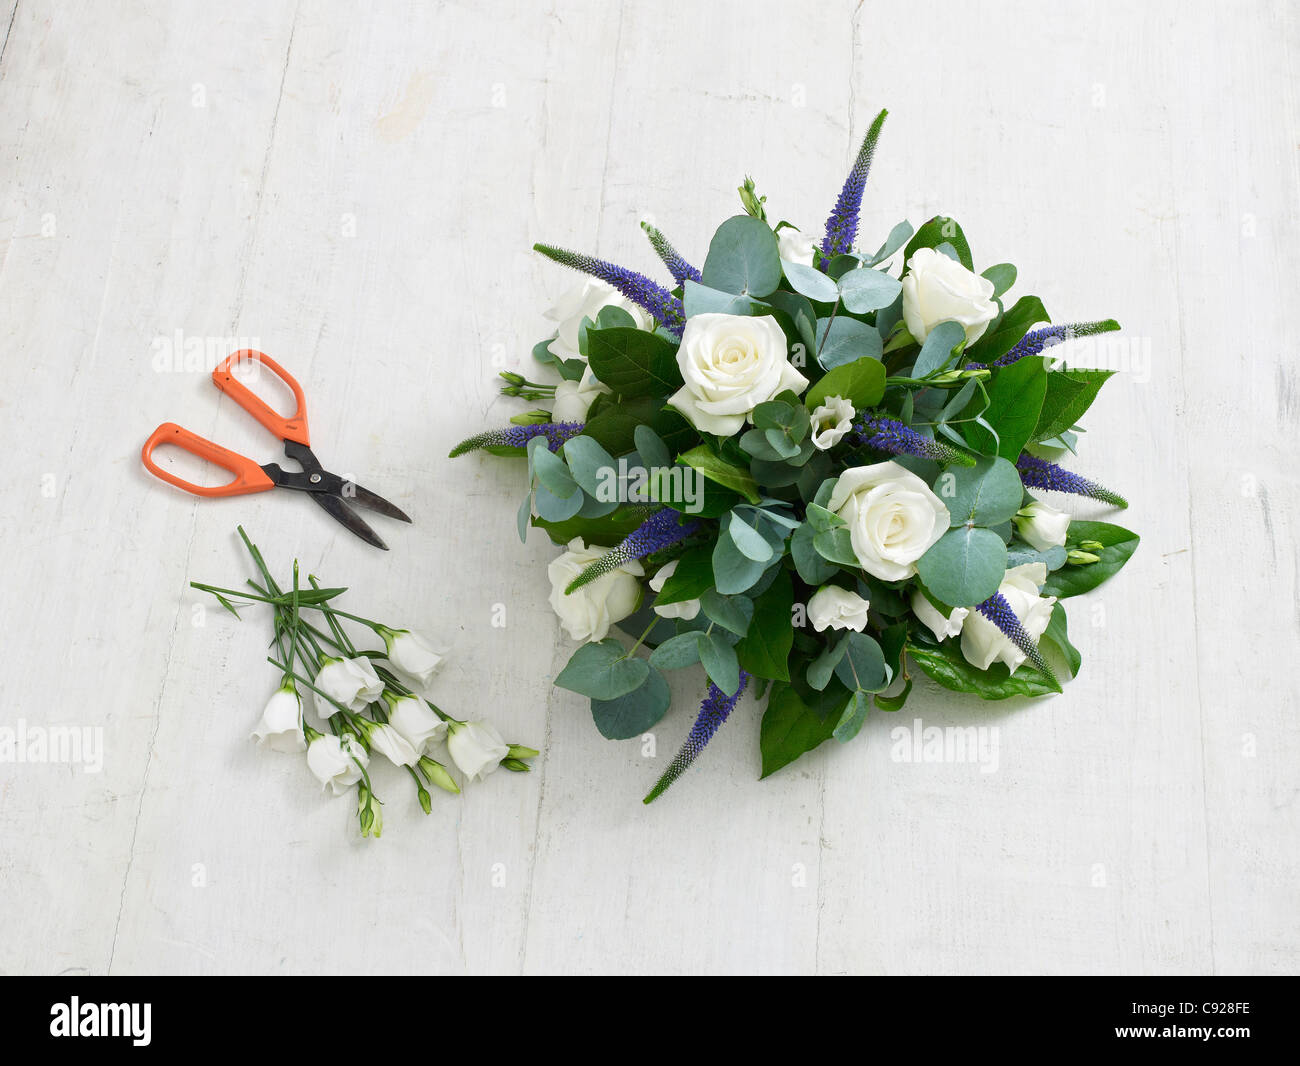 Floral foam arrangement, white lisianthus, white roses, purple veronica, salal and eucalyptus foliage - Stock Image